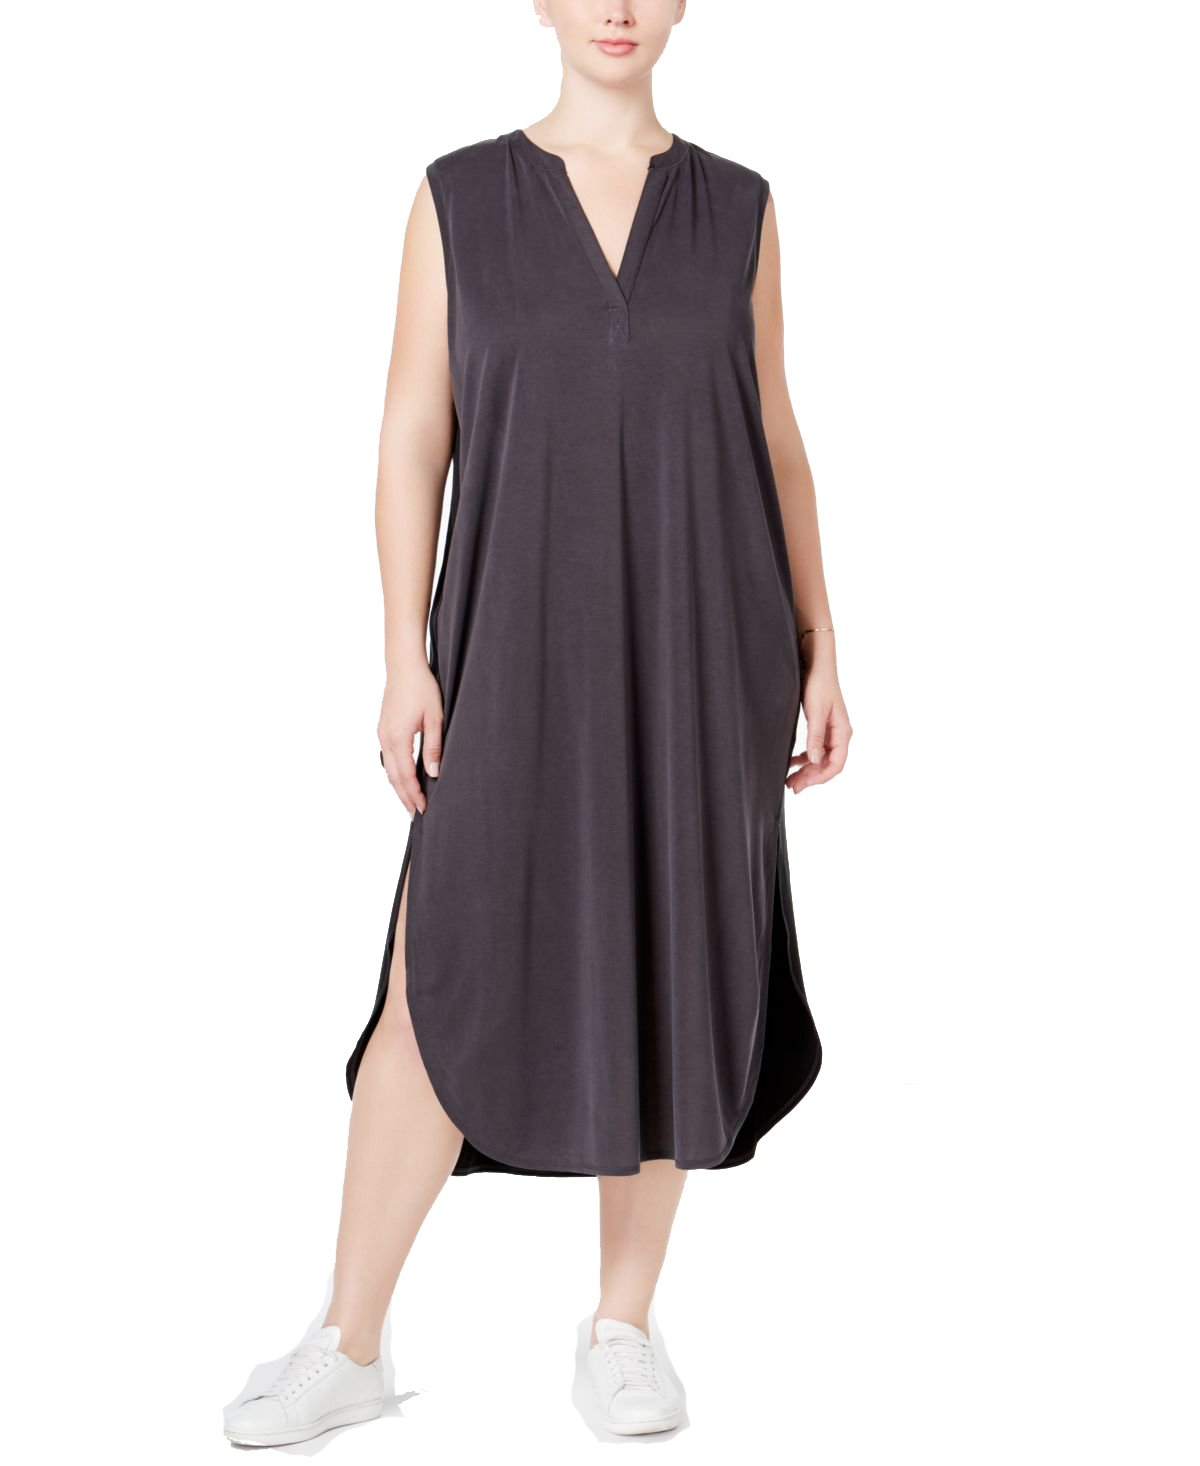 Rachel Rachel Roy Womens Plus Modal Split-Neck Casual Dress Black 2X